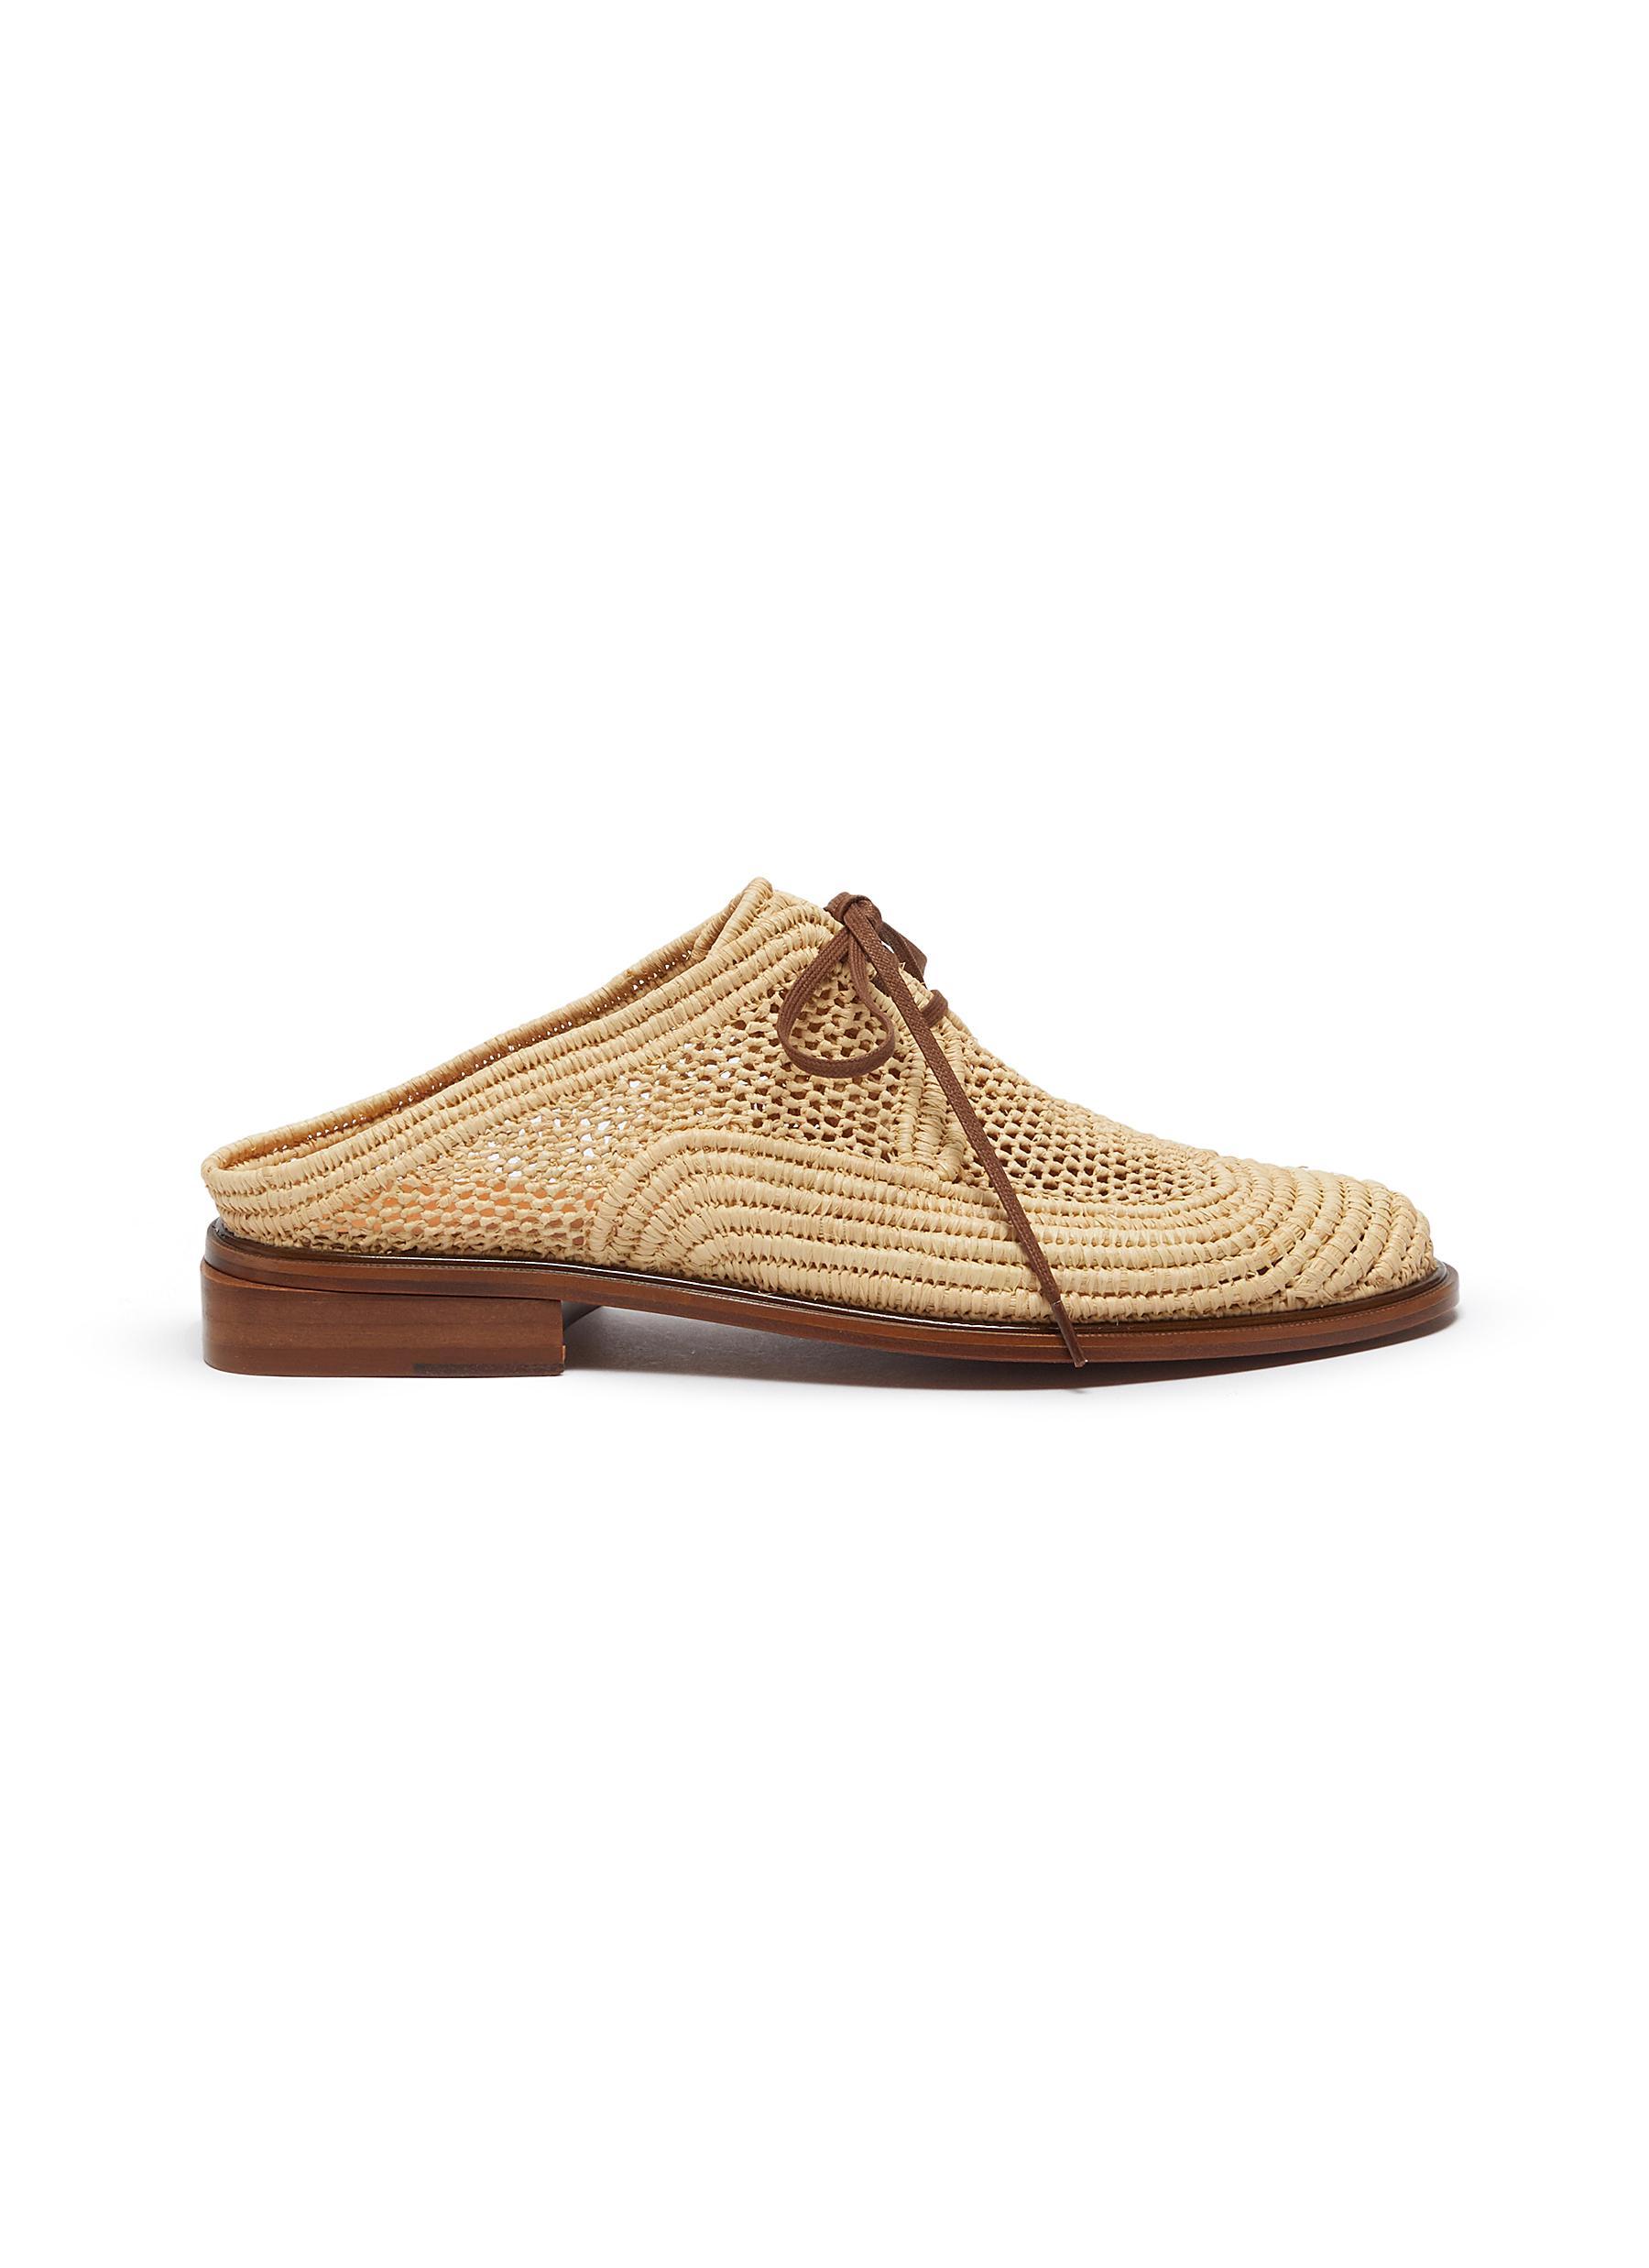 Clergerie Flats Jaly lace up raffia shoes